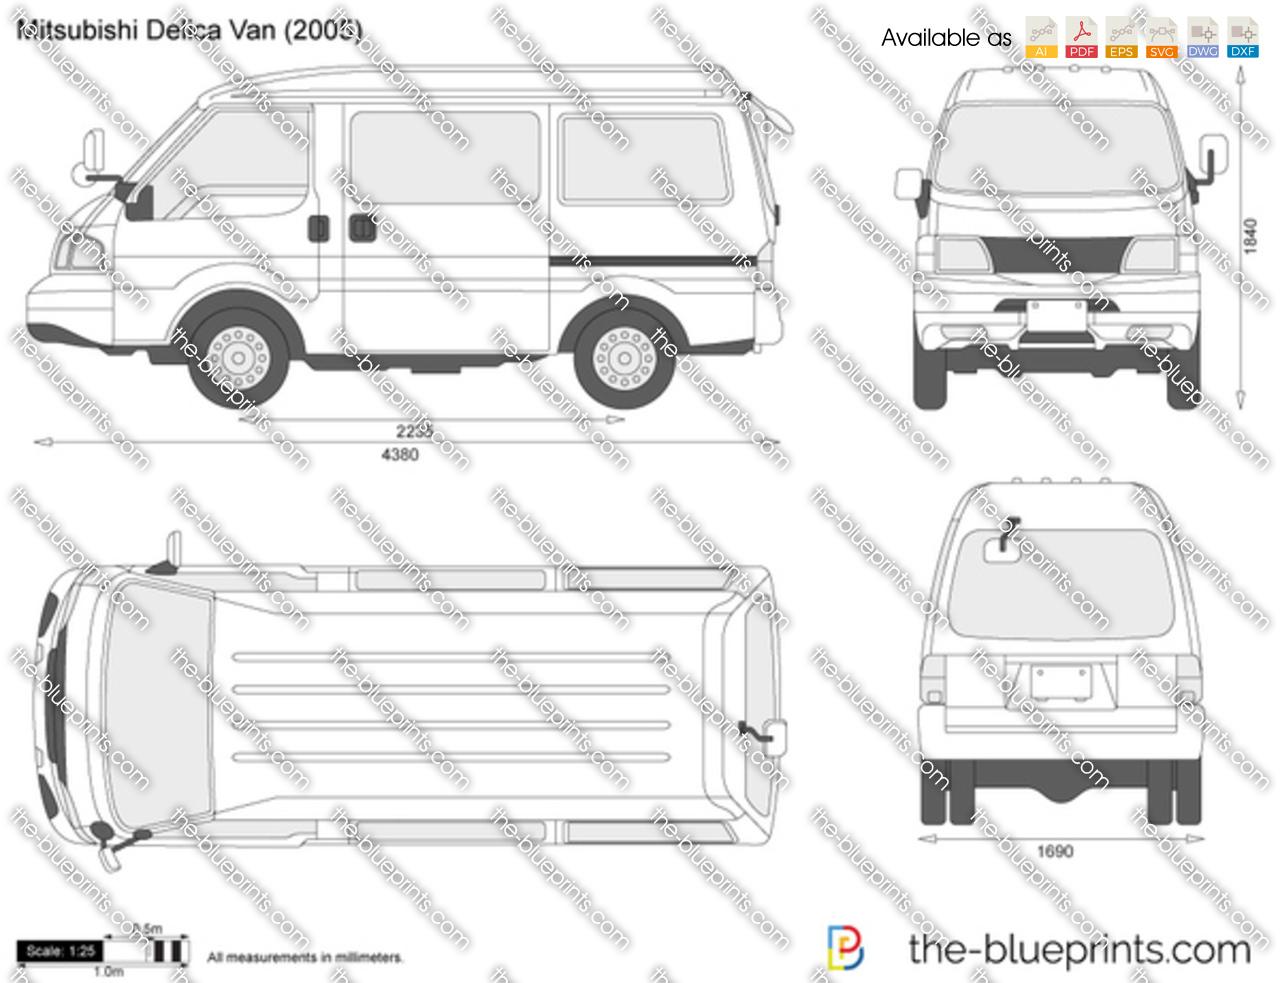 Mitsubishi Delica Van 2004